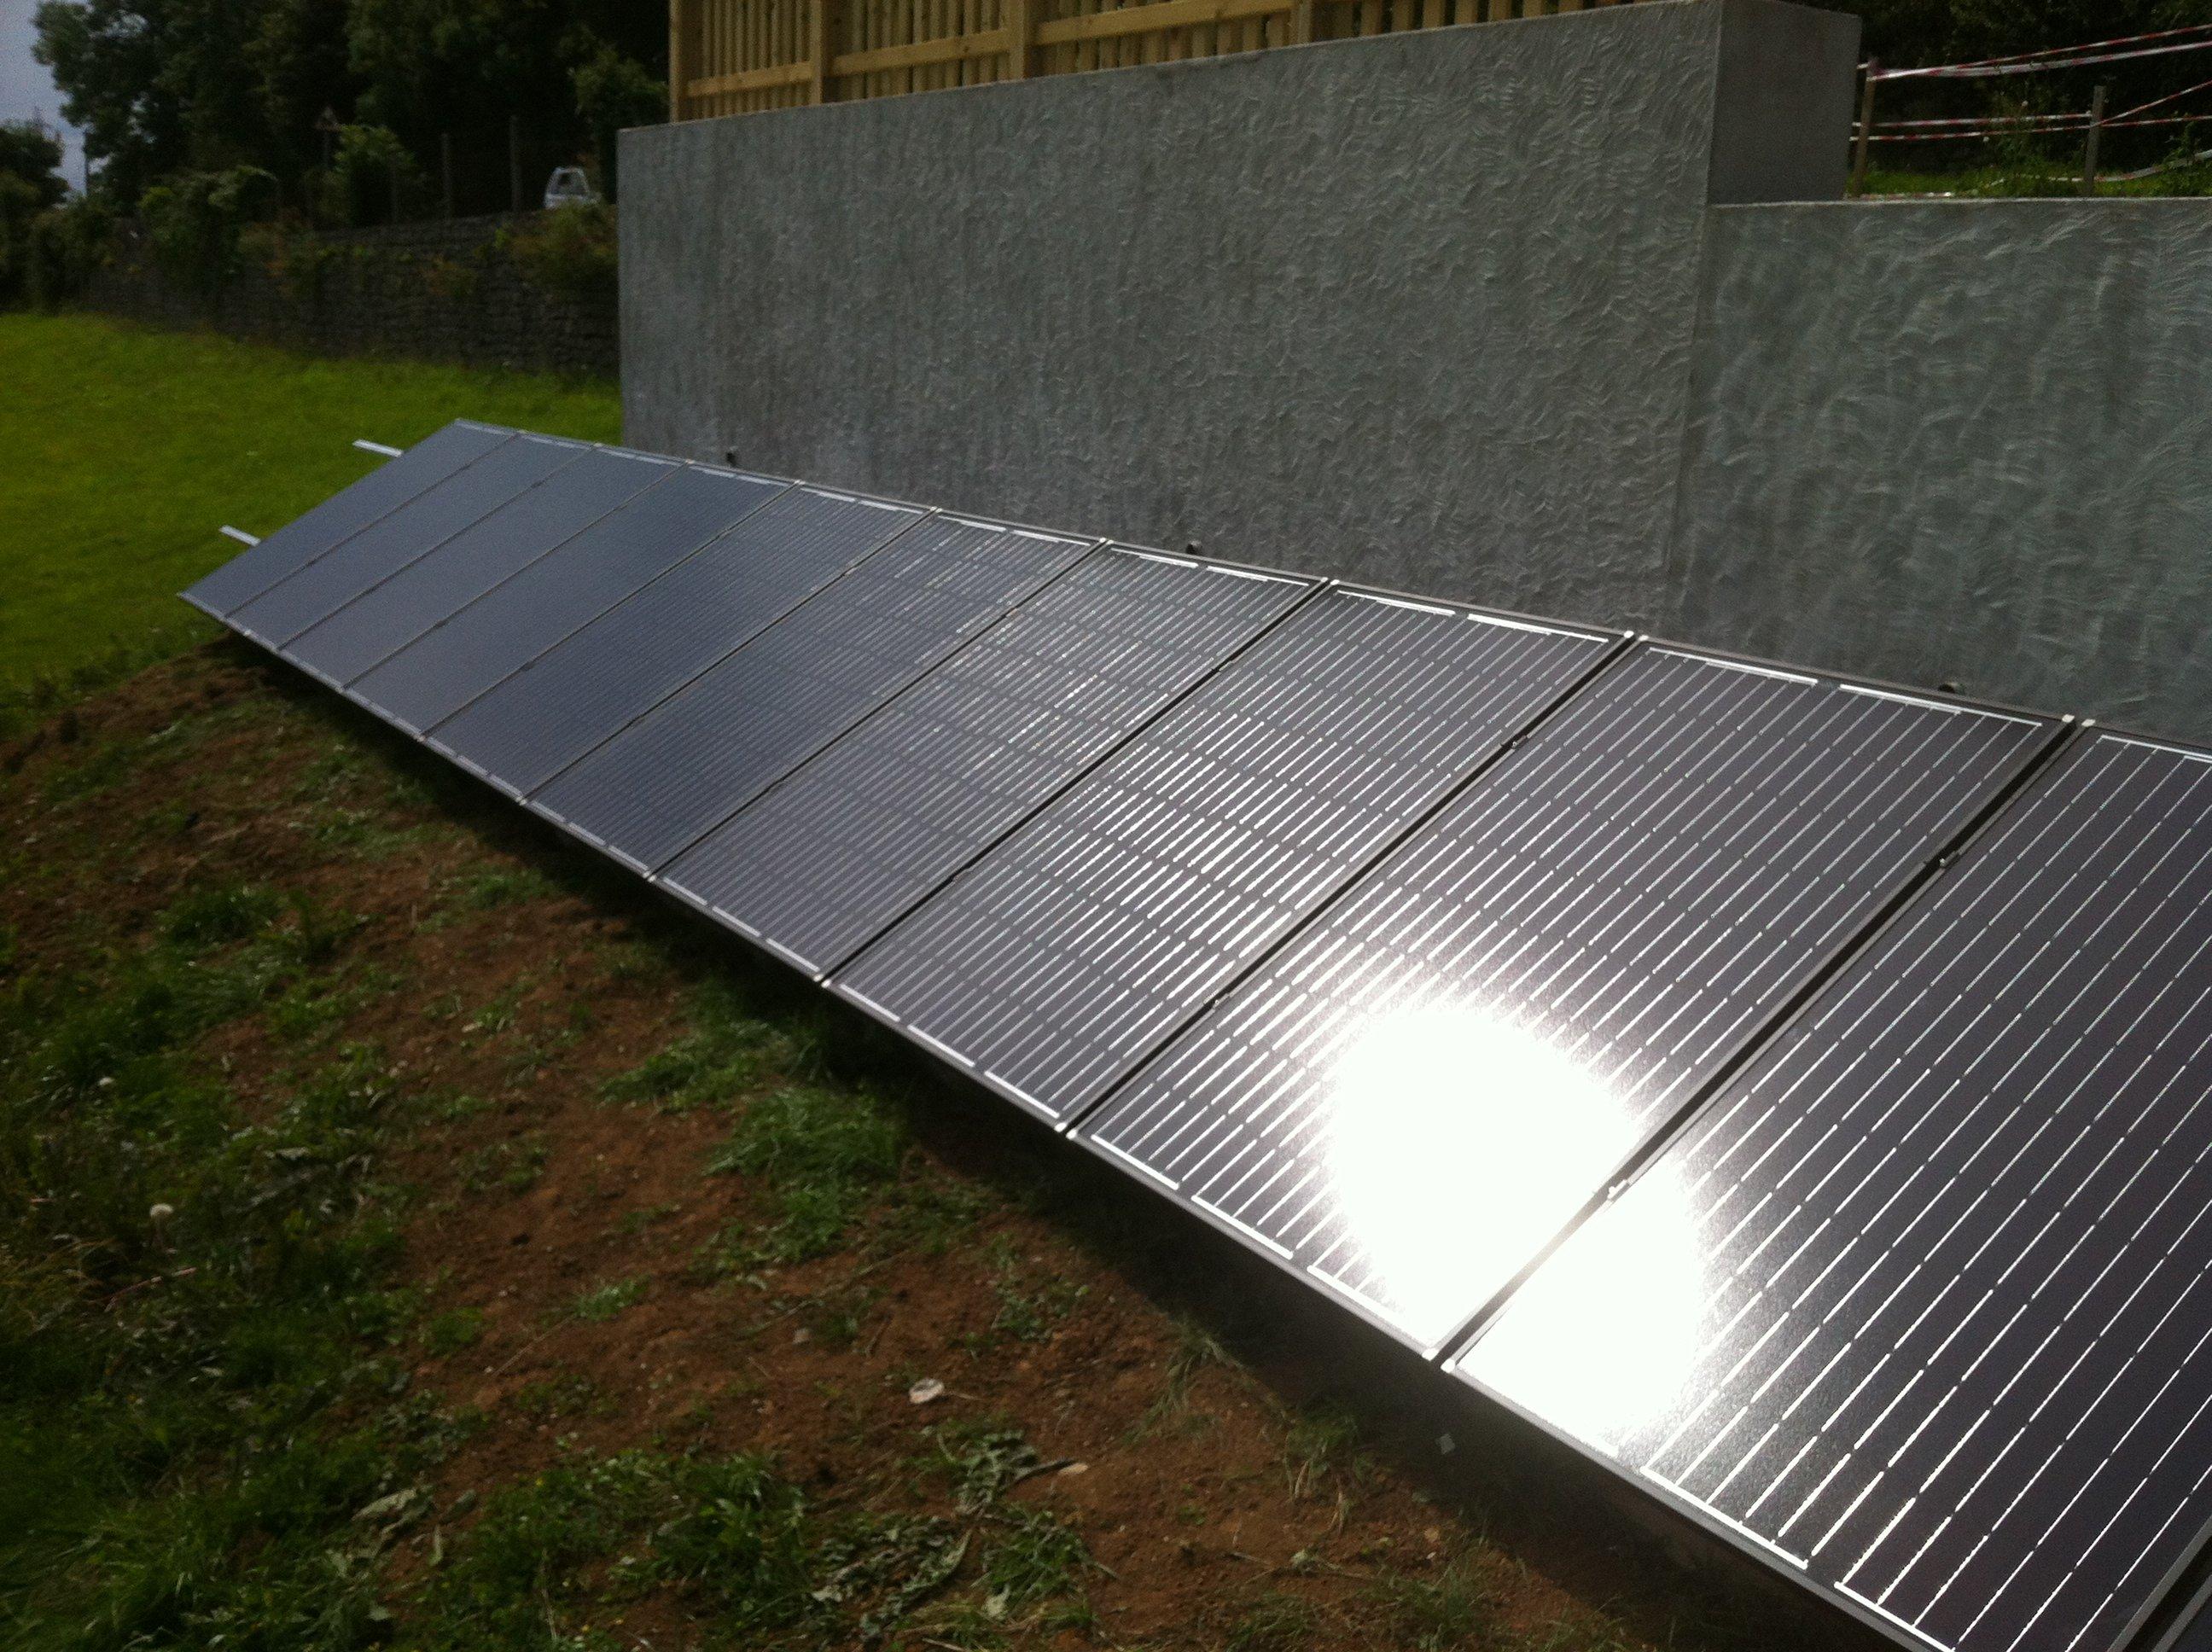 sun rays falling on the solar panel